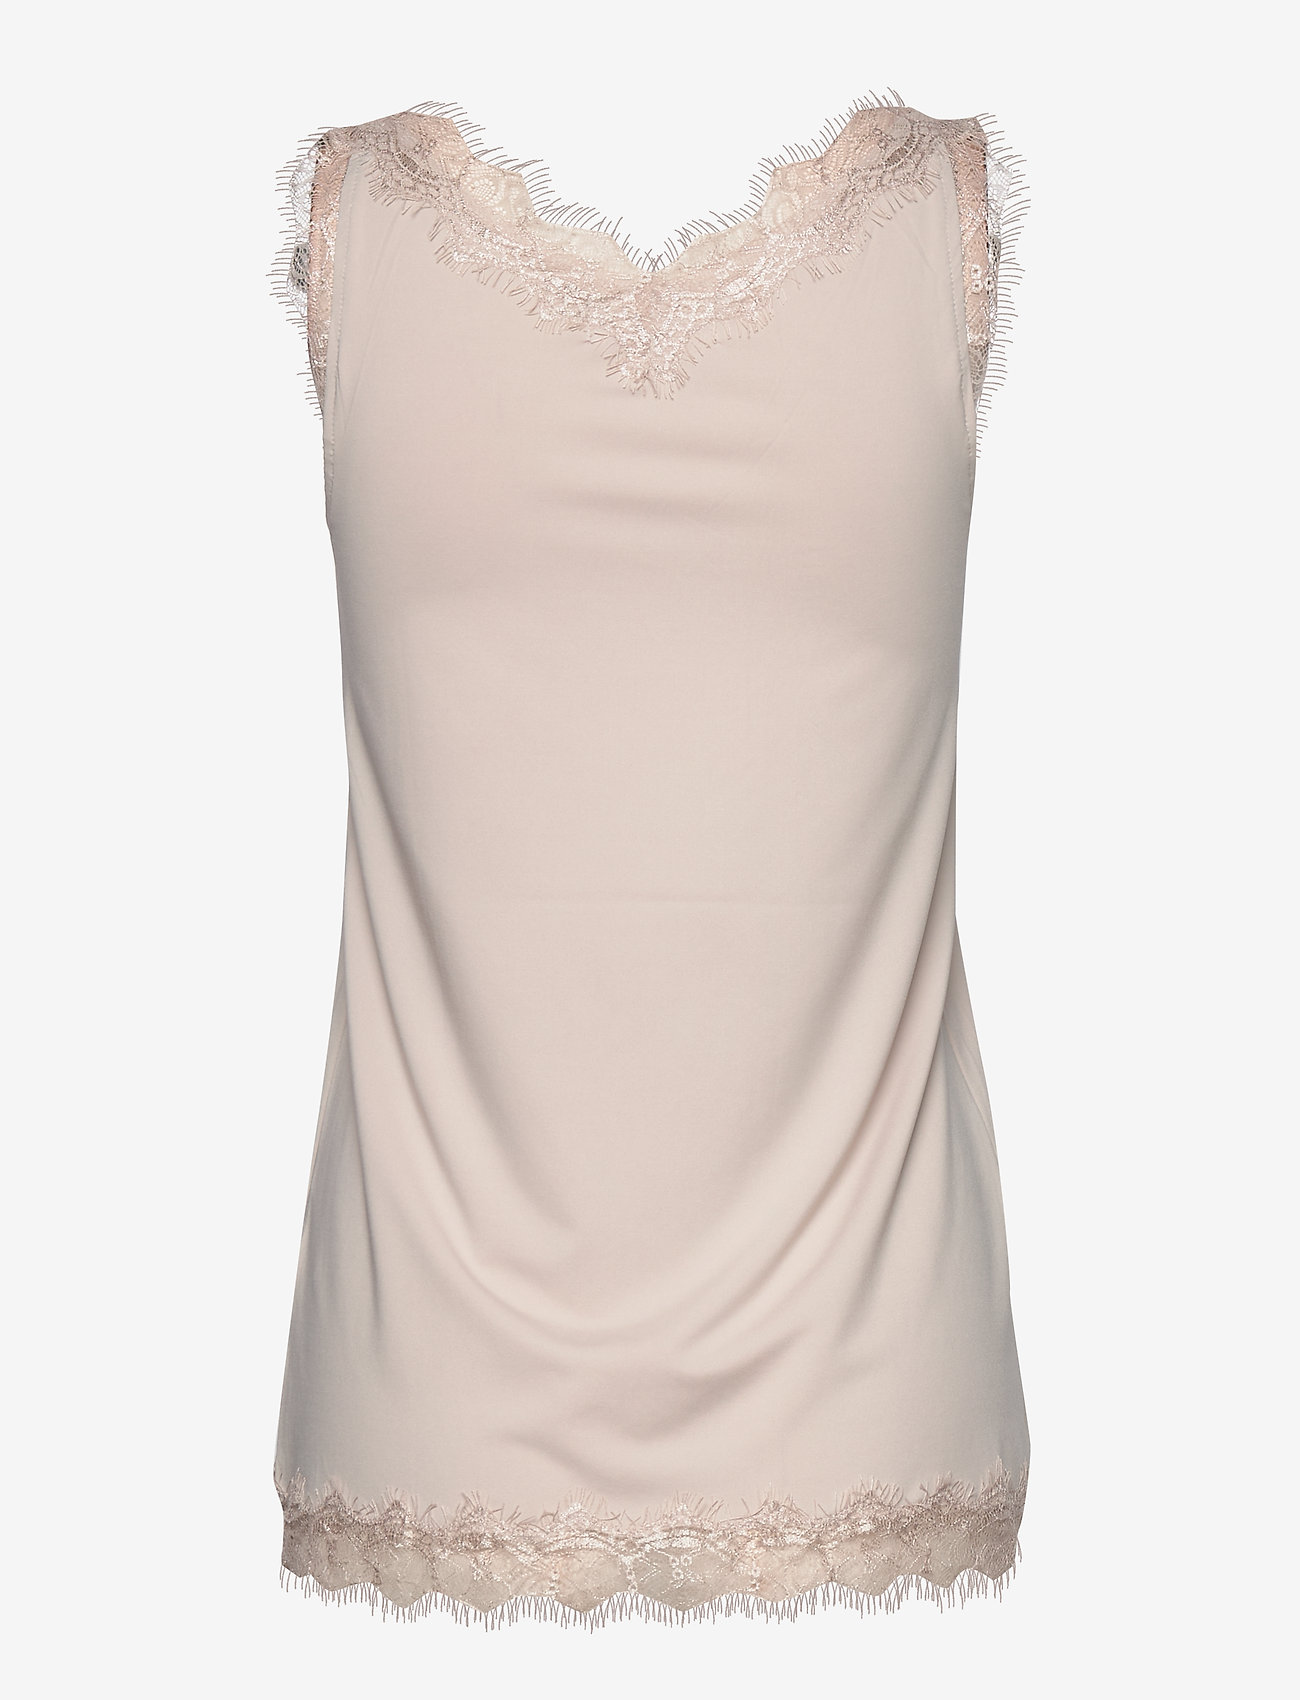 Rosemunde Top - T-shirts & Tops GRAY MORN